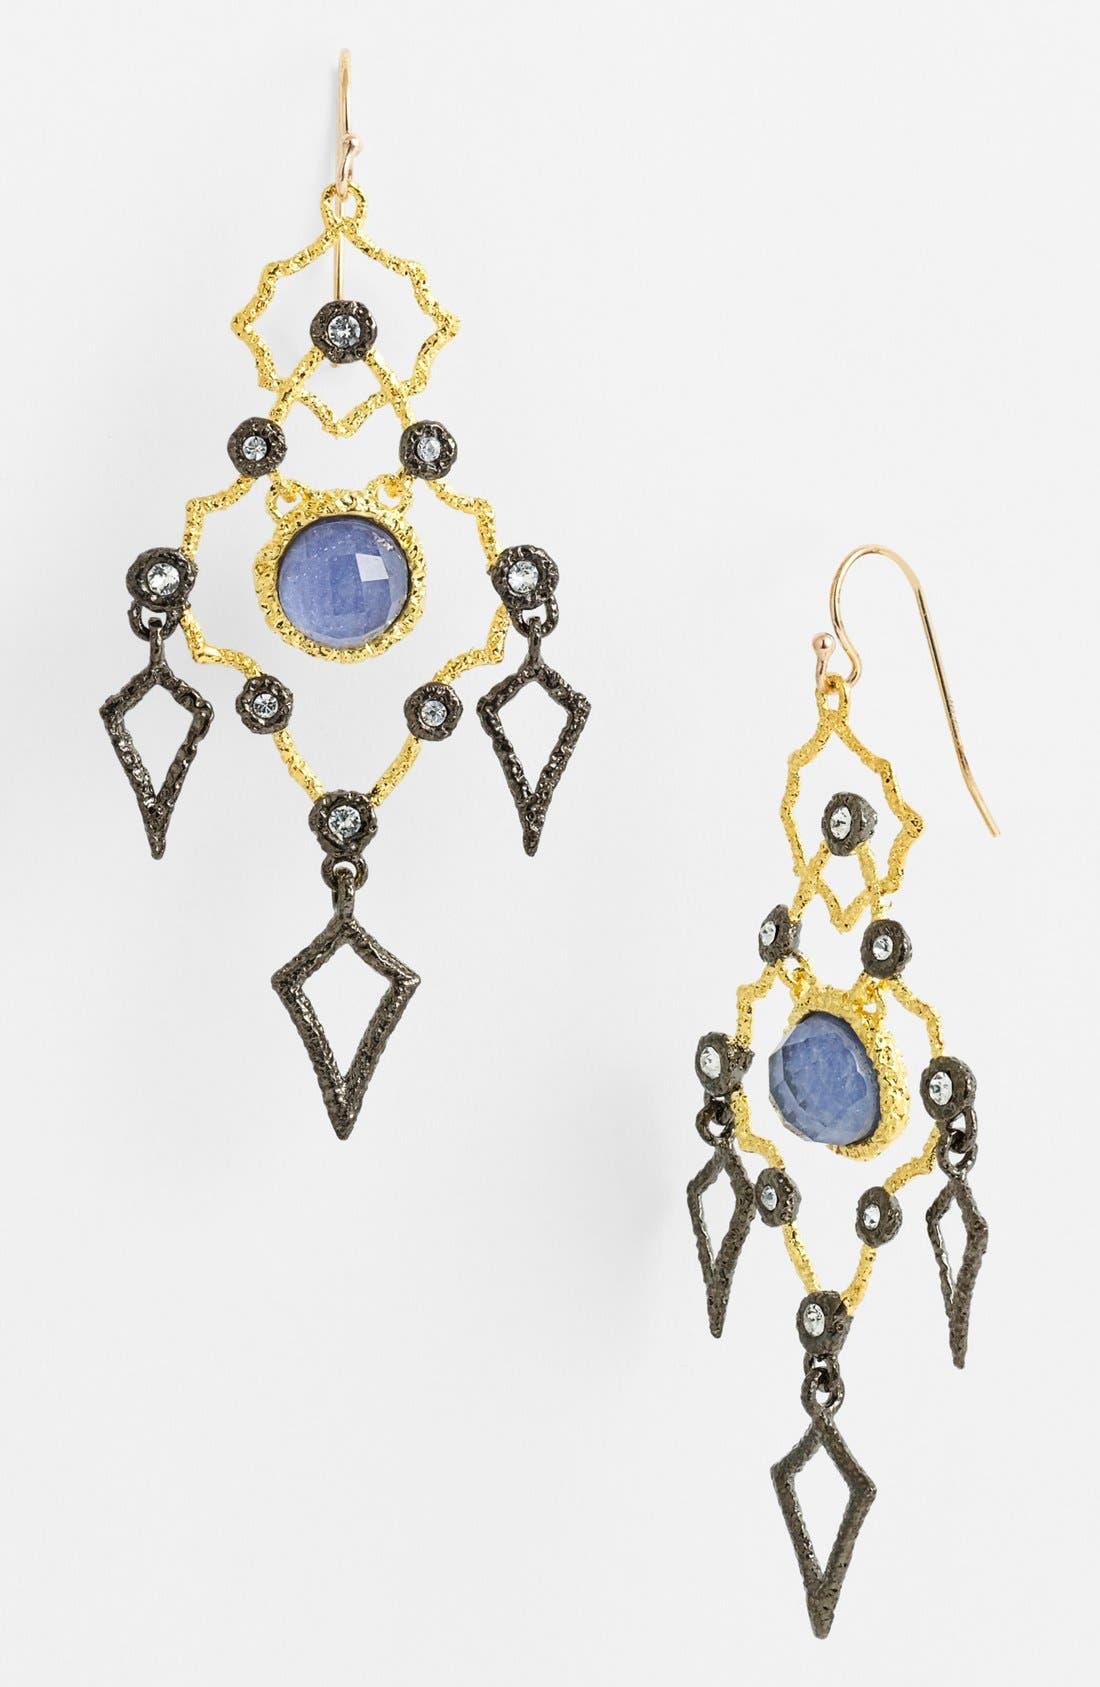 Main Image - Alexis Bittar 'Elements - Jardin de Papillon' Chandelier Earrings